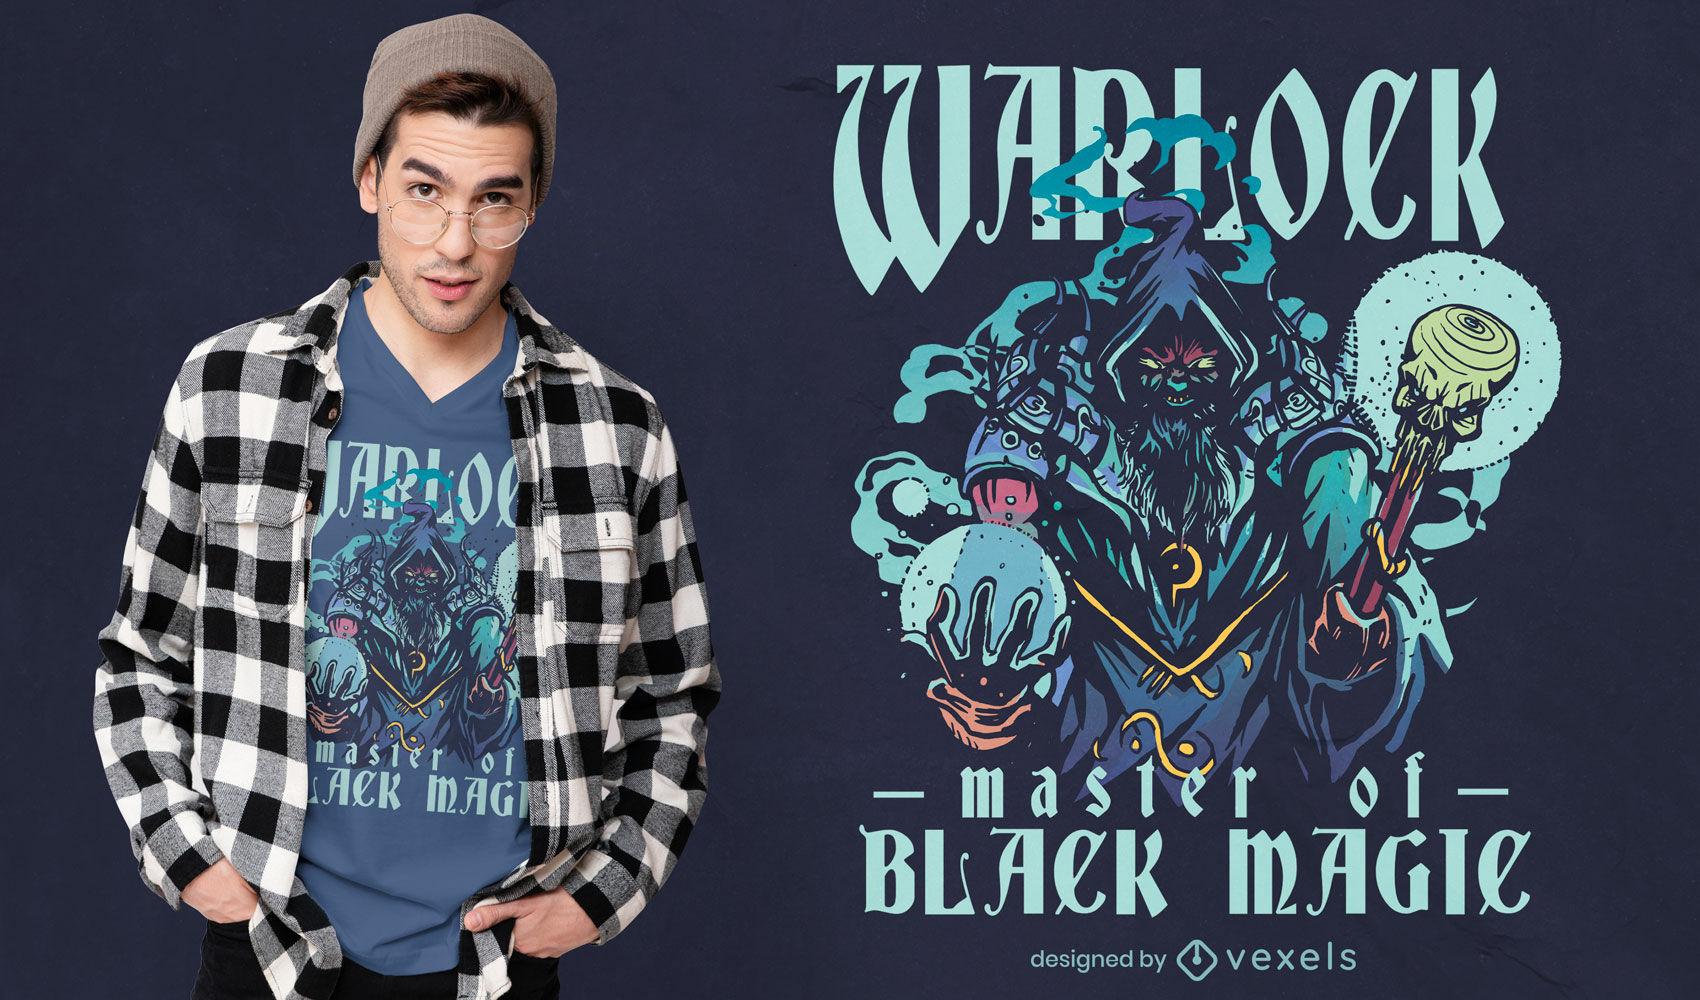 Warlock black magic t-shirt design